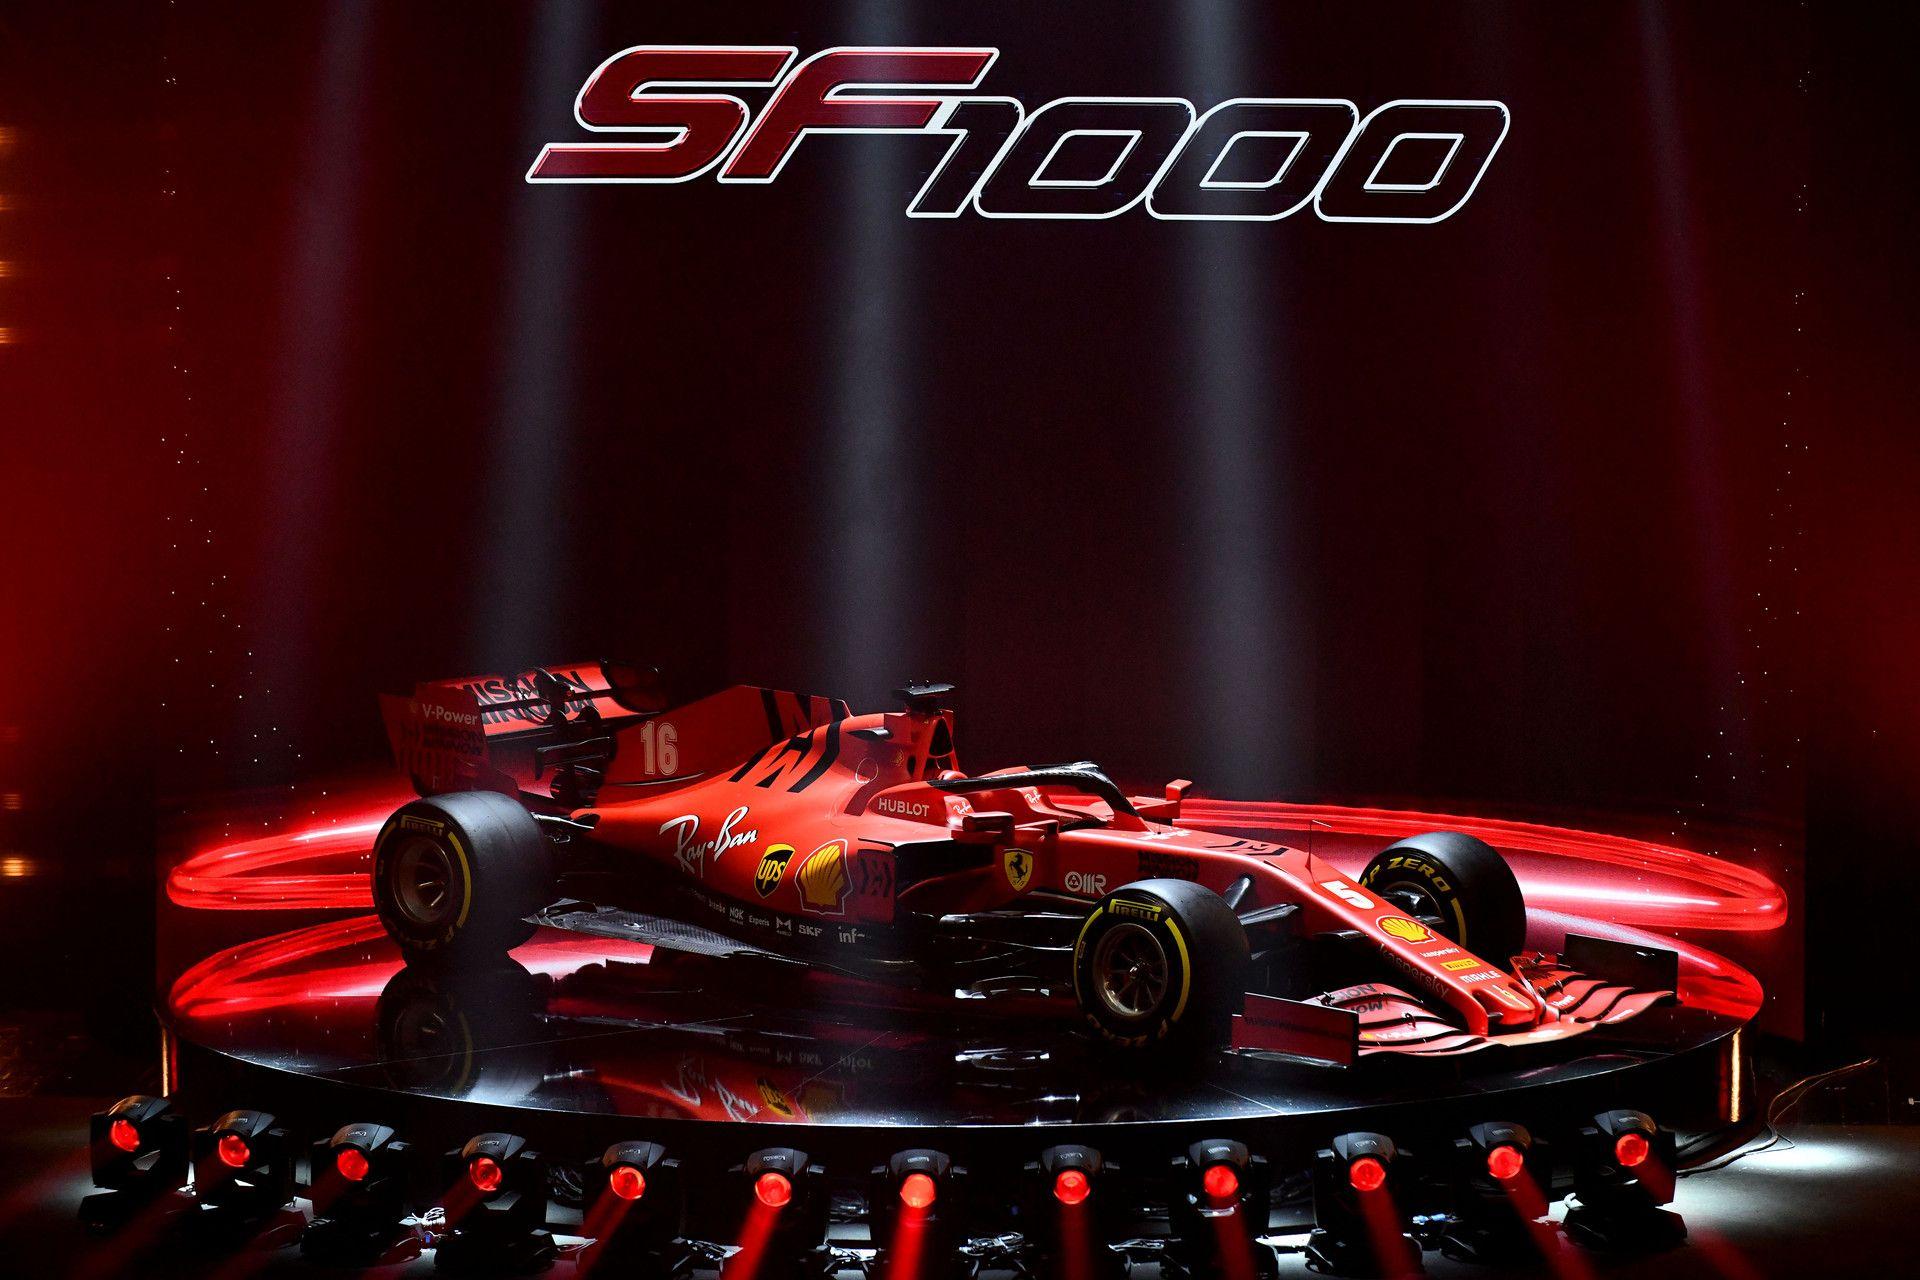 Ferrari Sf1000 El Arma De La Scuderia Para 2020